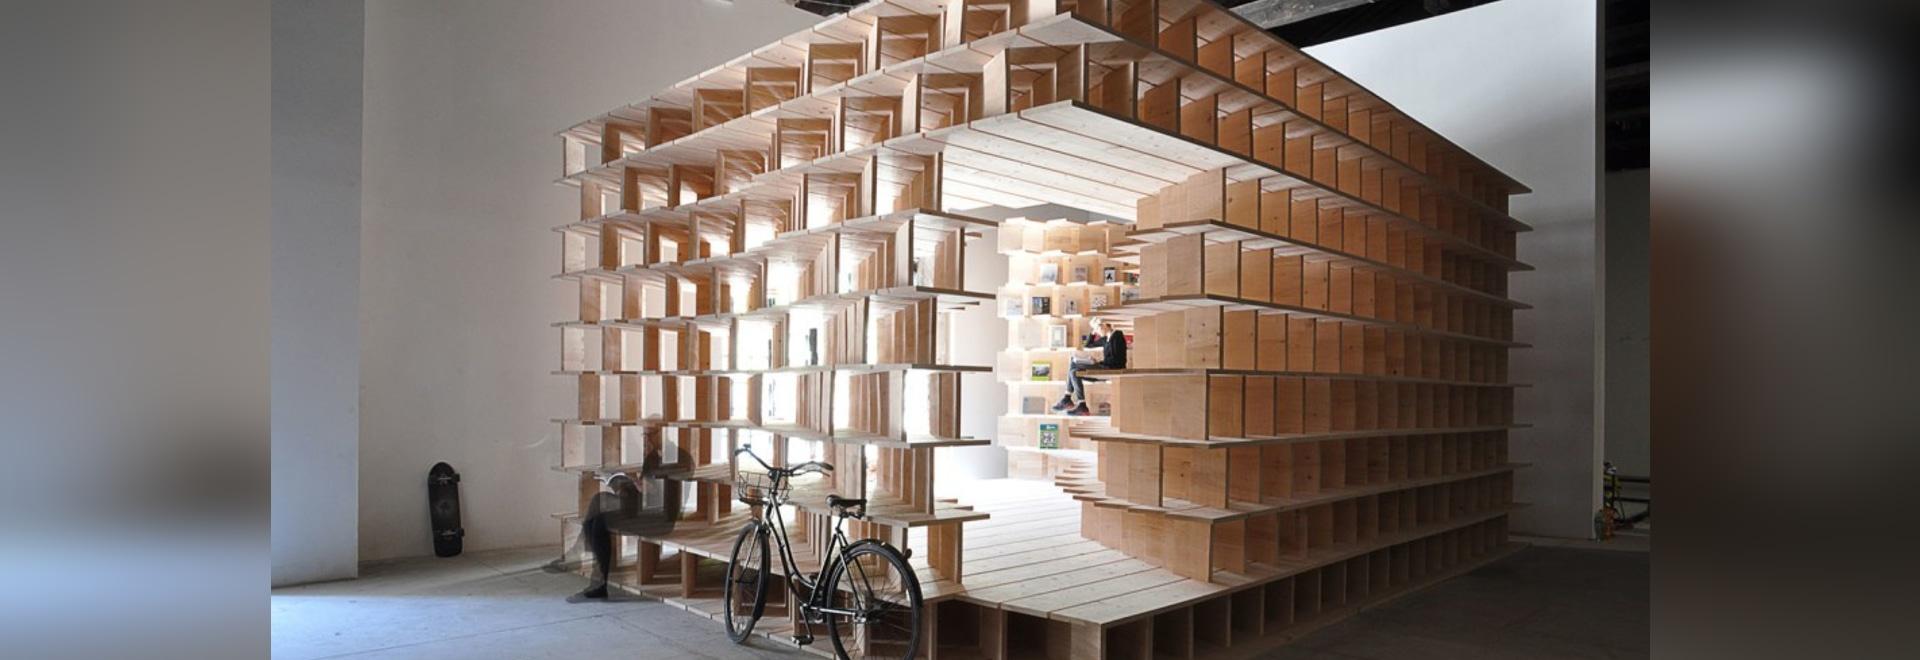 Slovenia Built A Habitable Structure With Latticed Wooden Bookshelves